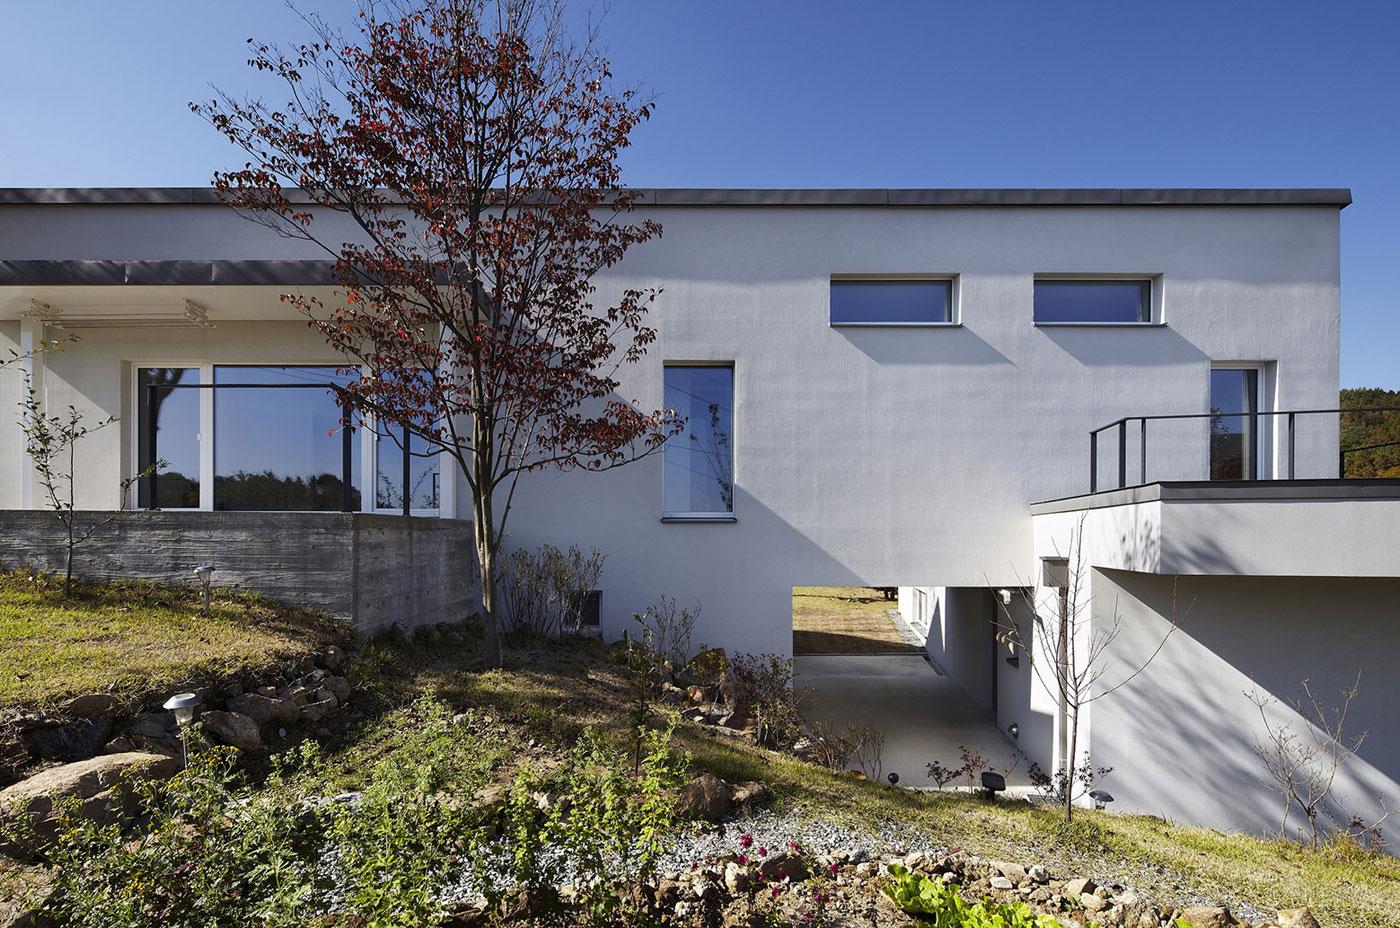 Yangpyeong Passive House by Engineforce Architect-05